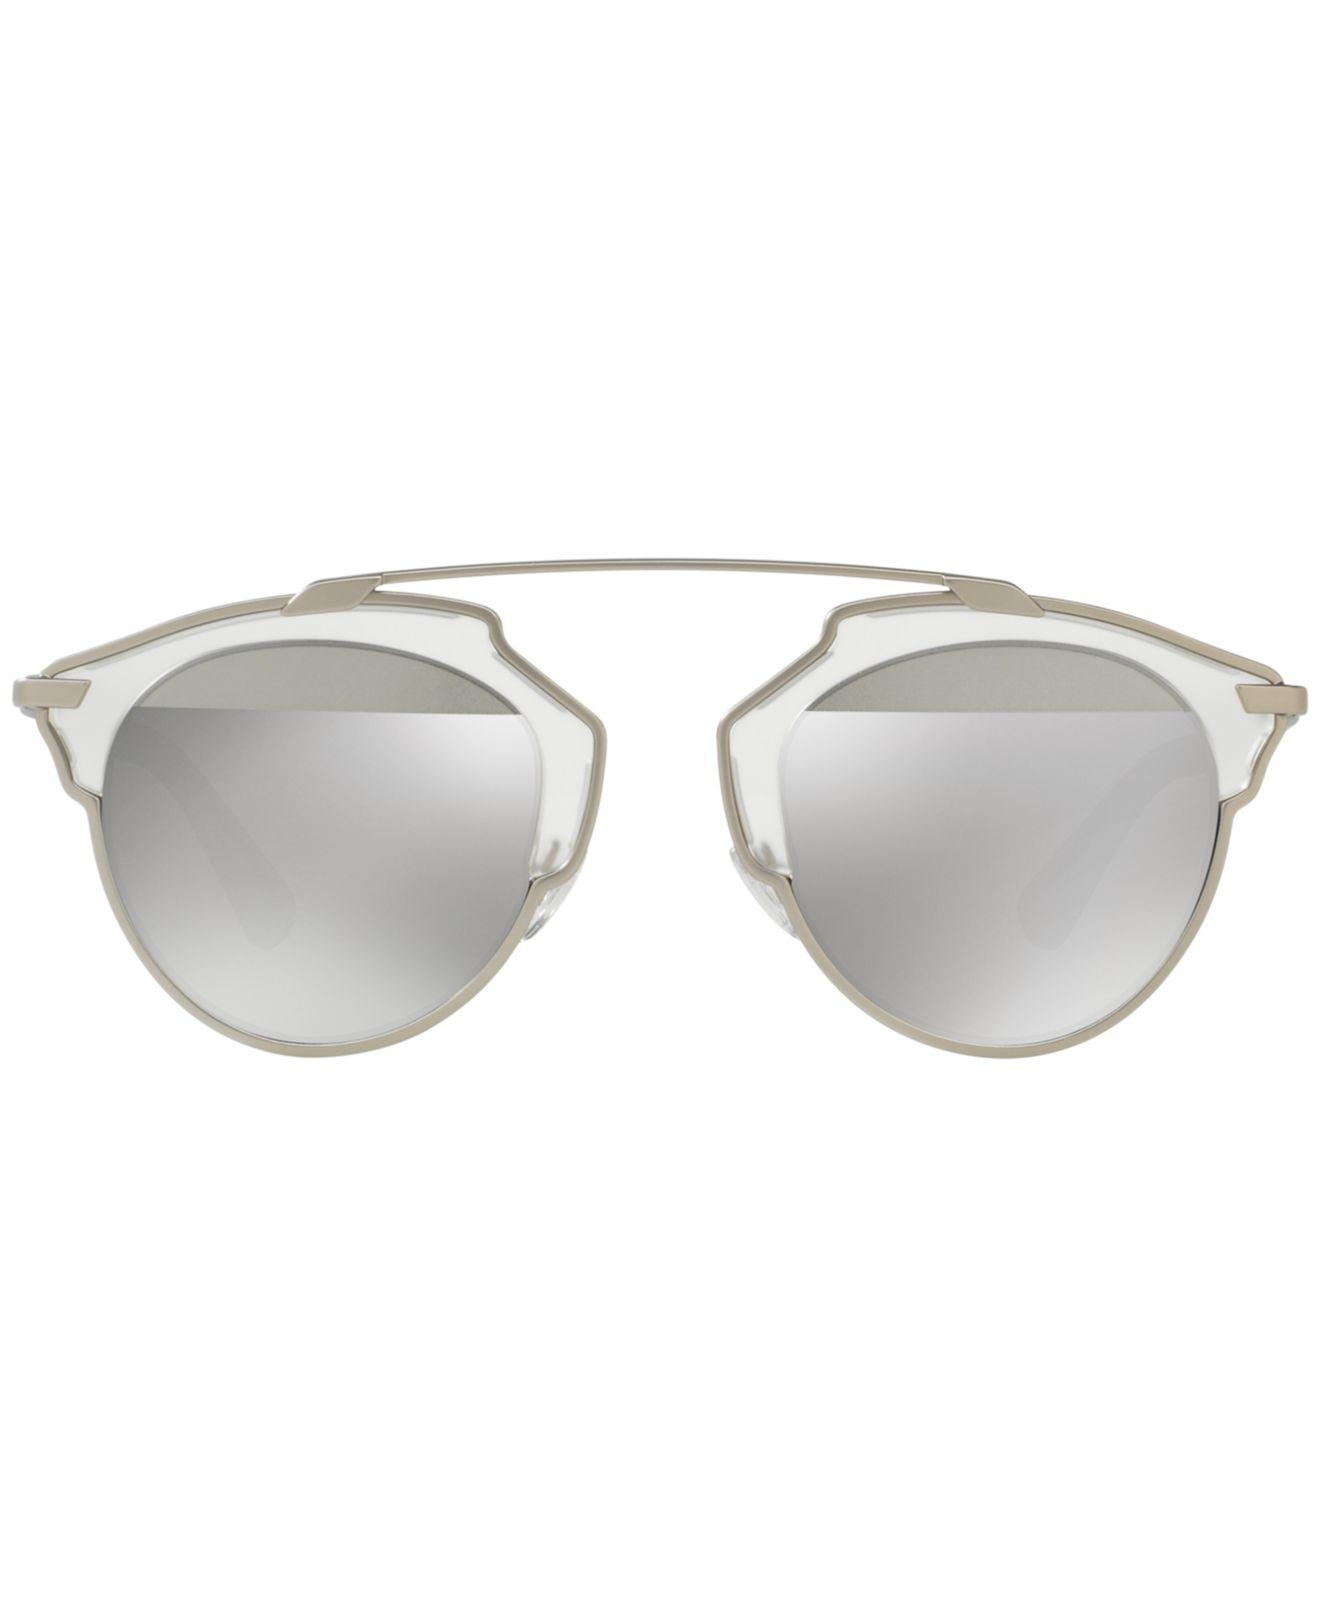 7bebd9f2690 Lyst - Dior Sunglasses